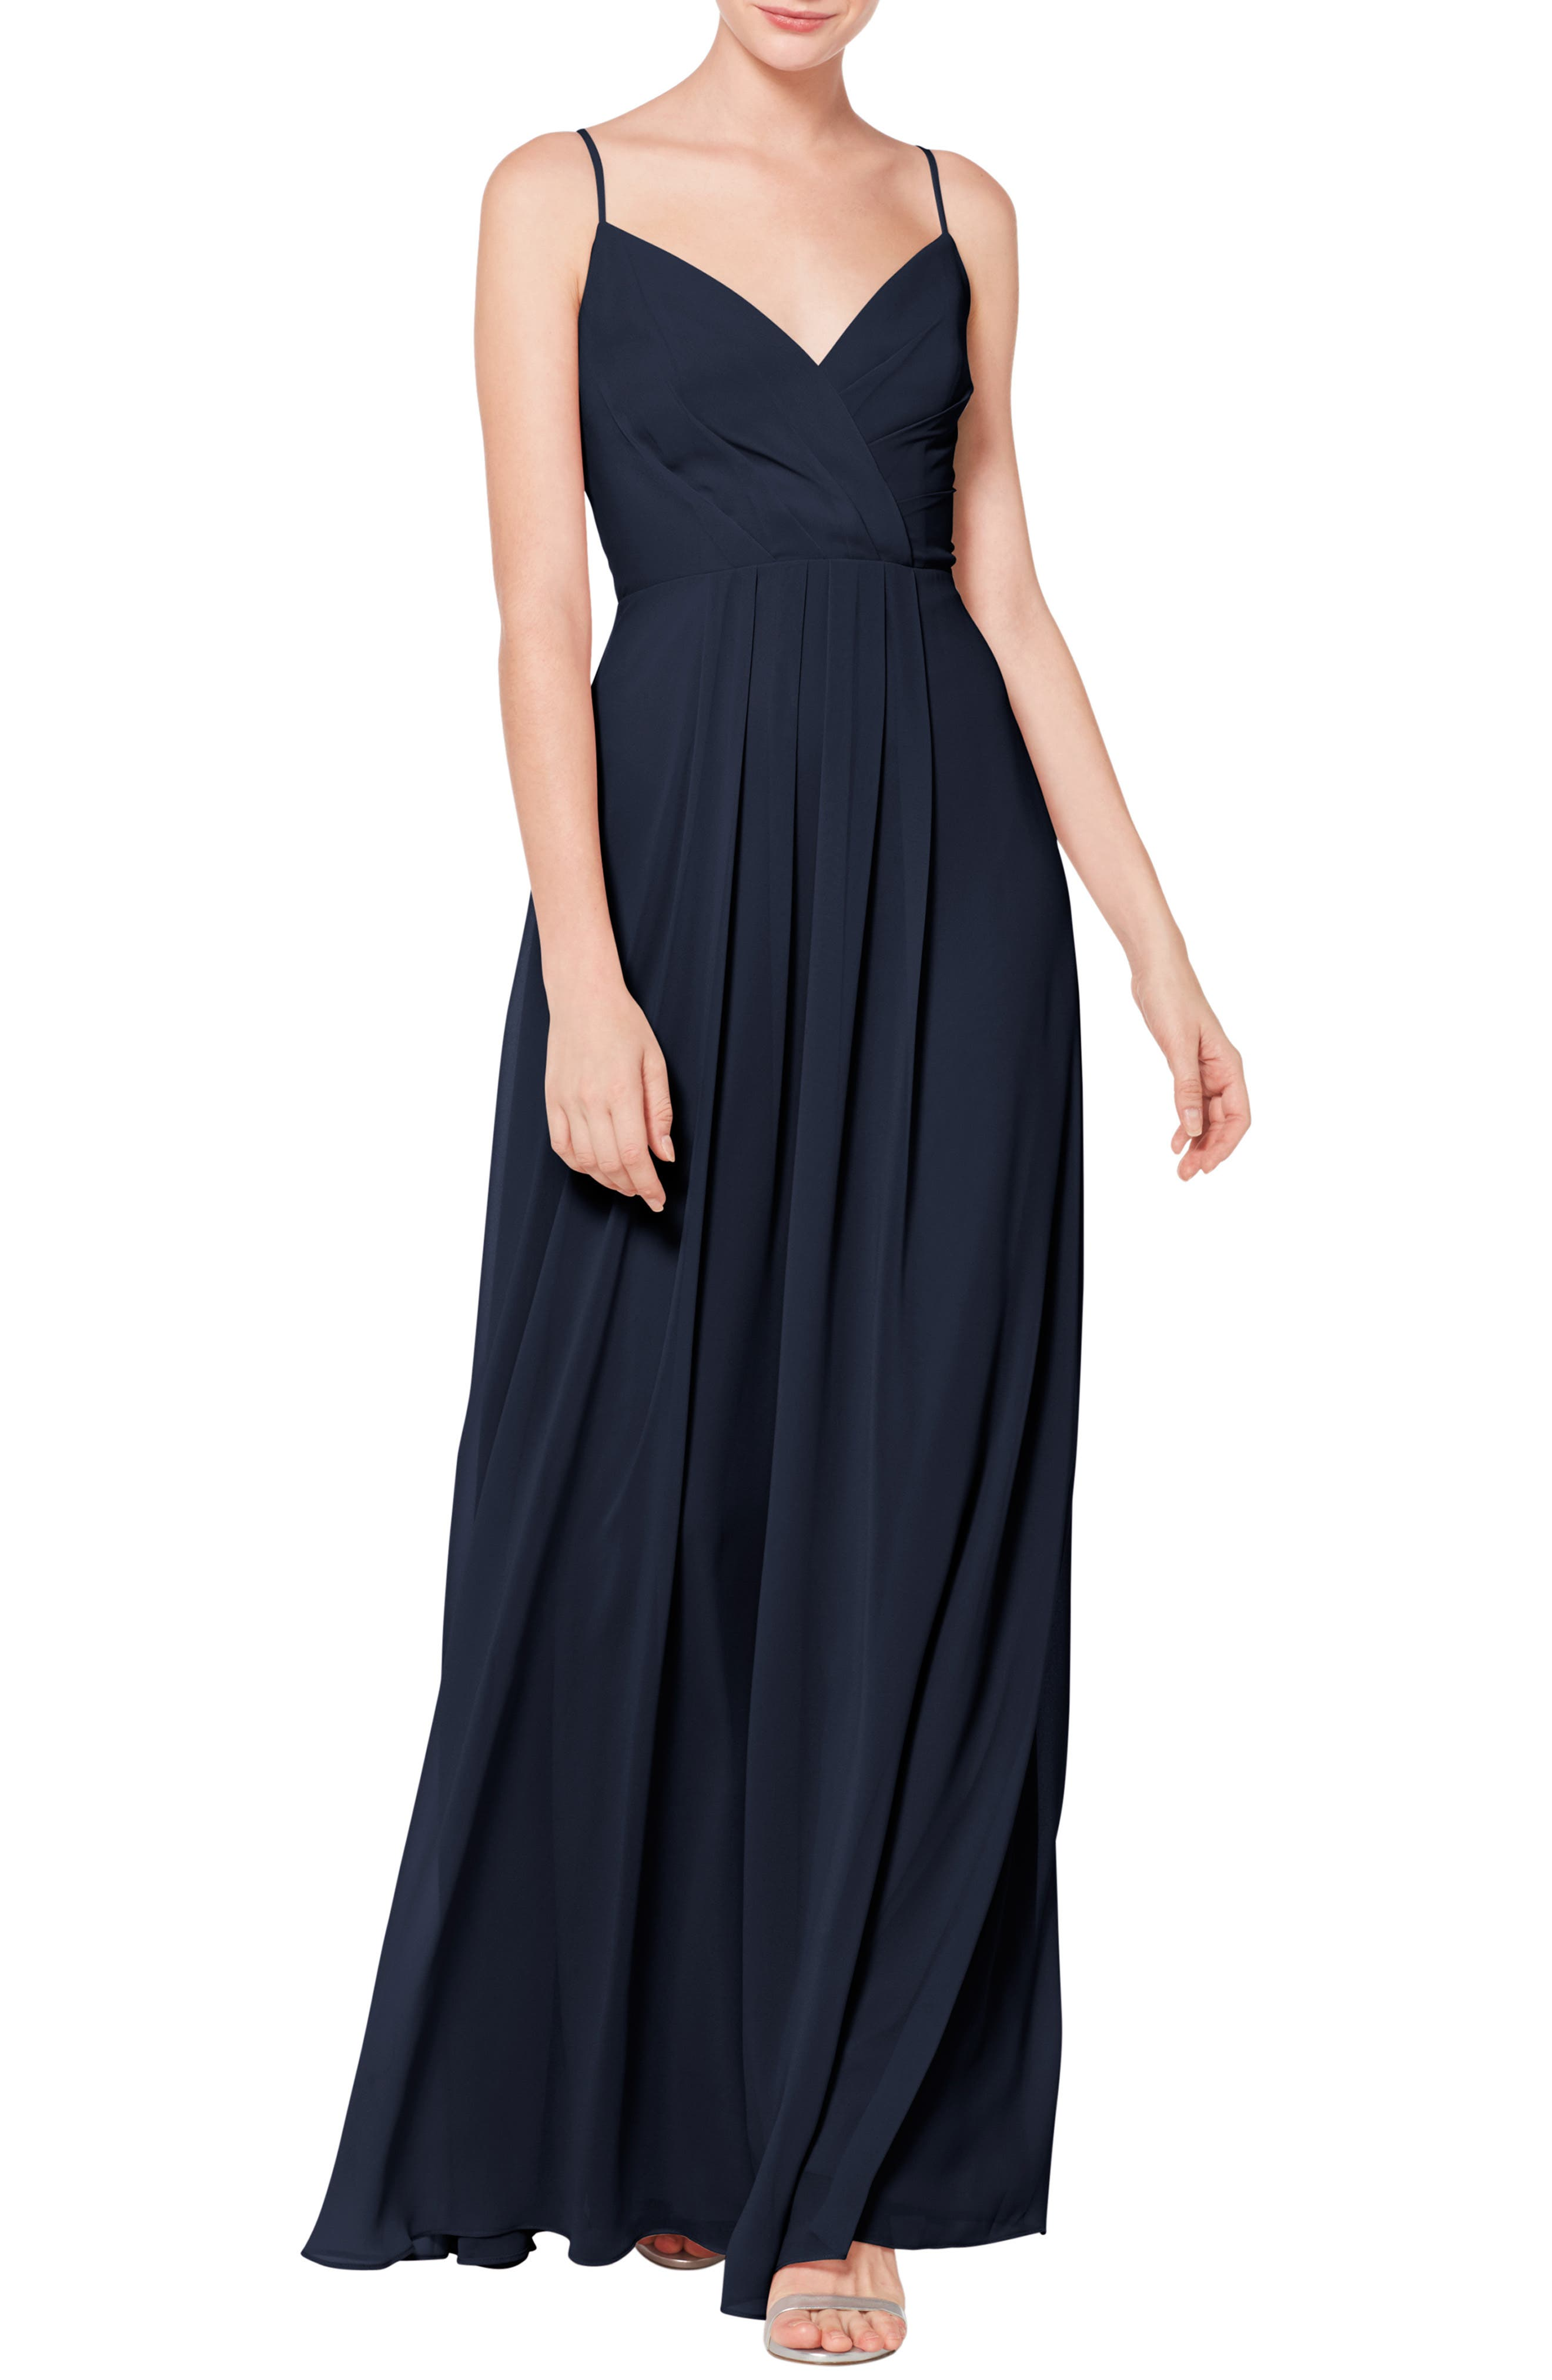 #LEVKOFF, Surplice Neck Chiffon Evening Dress, Main thumbnail 1, color, NAVY